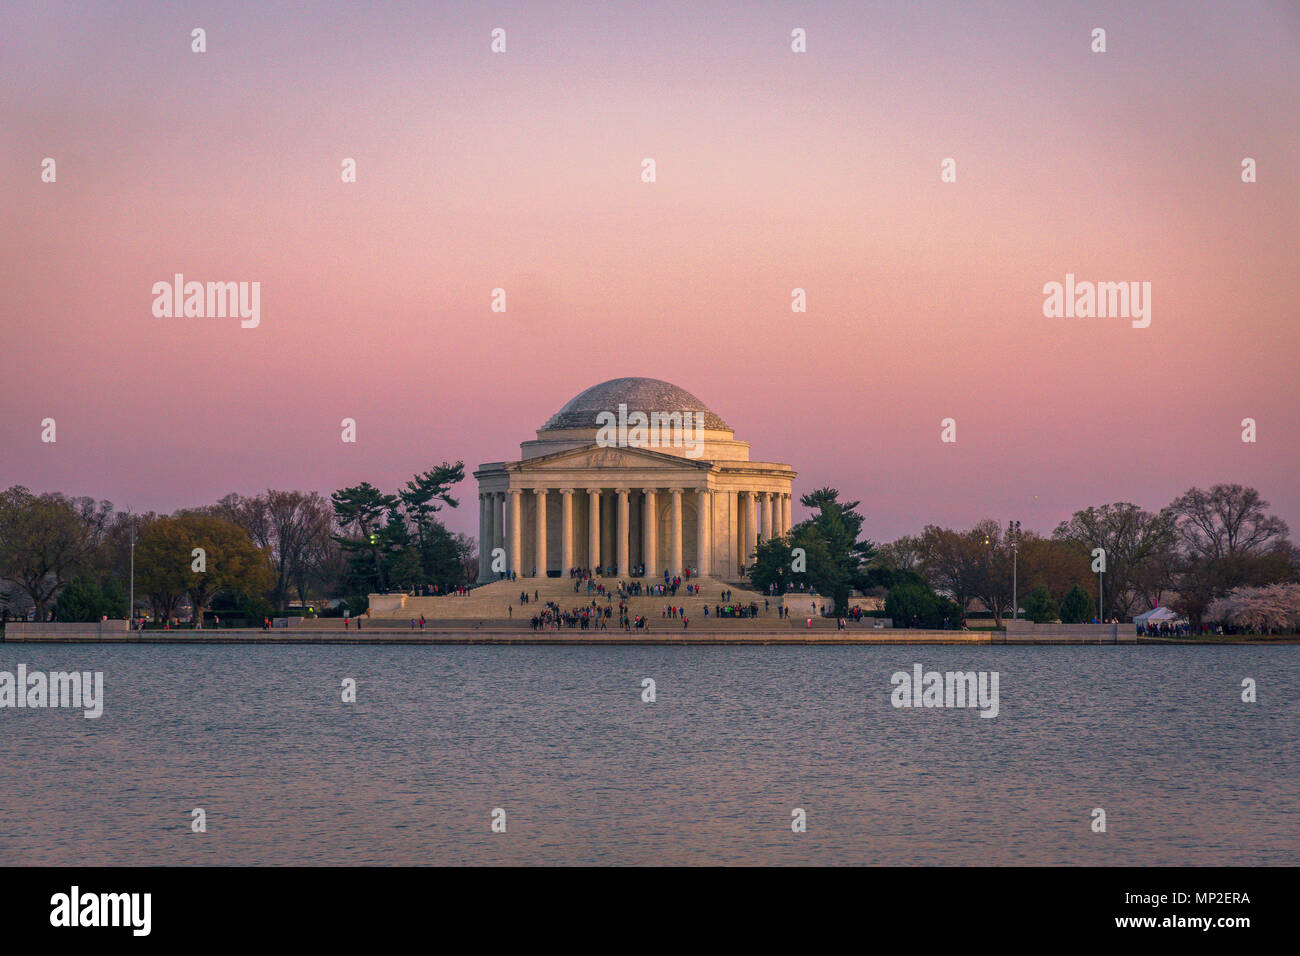 Washington, DC Cherry Blossom Festival Immagini Stock